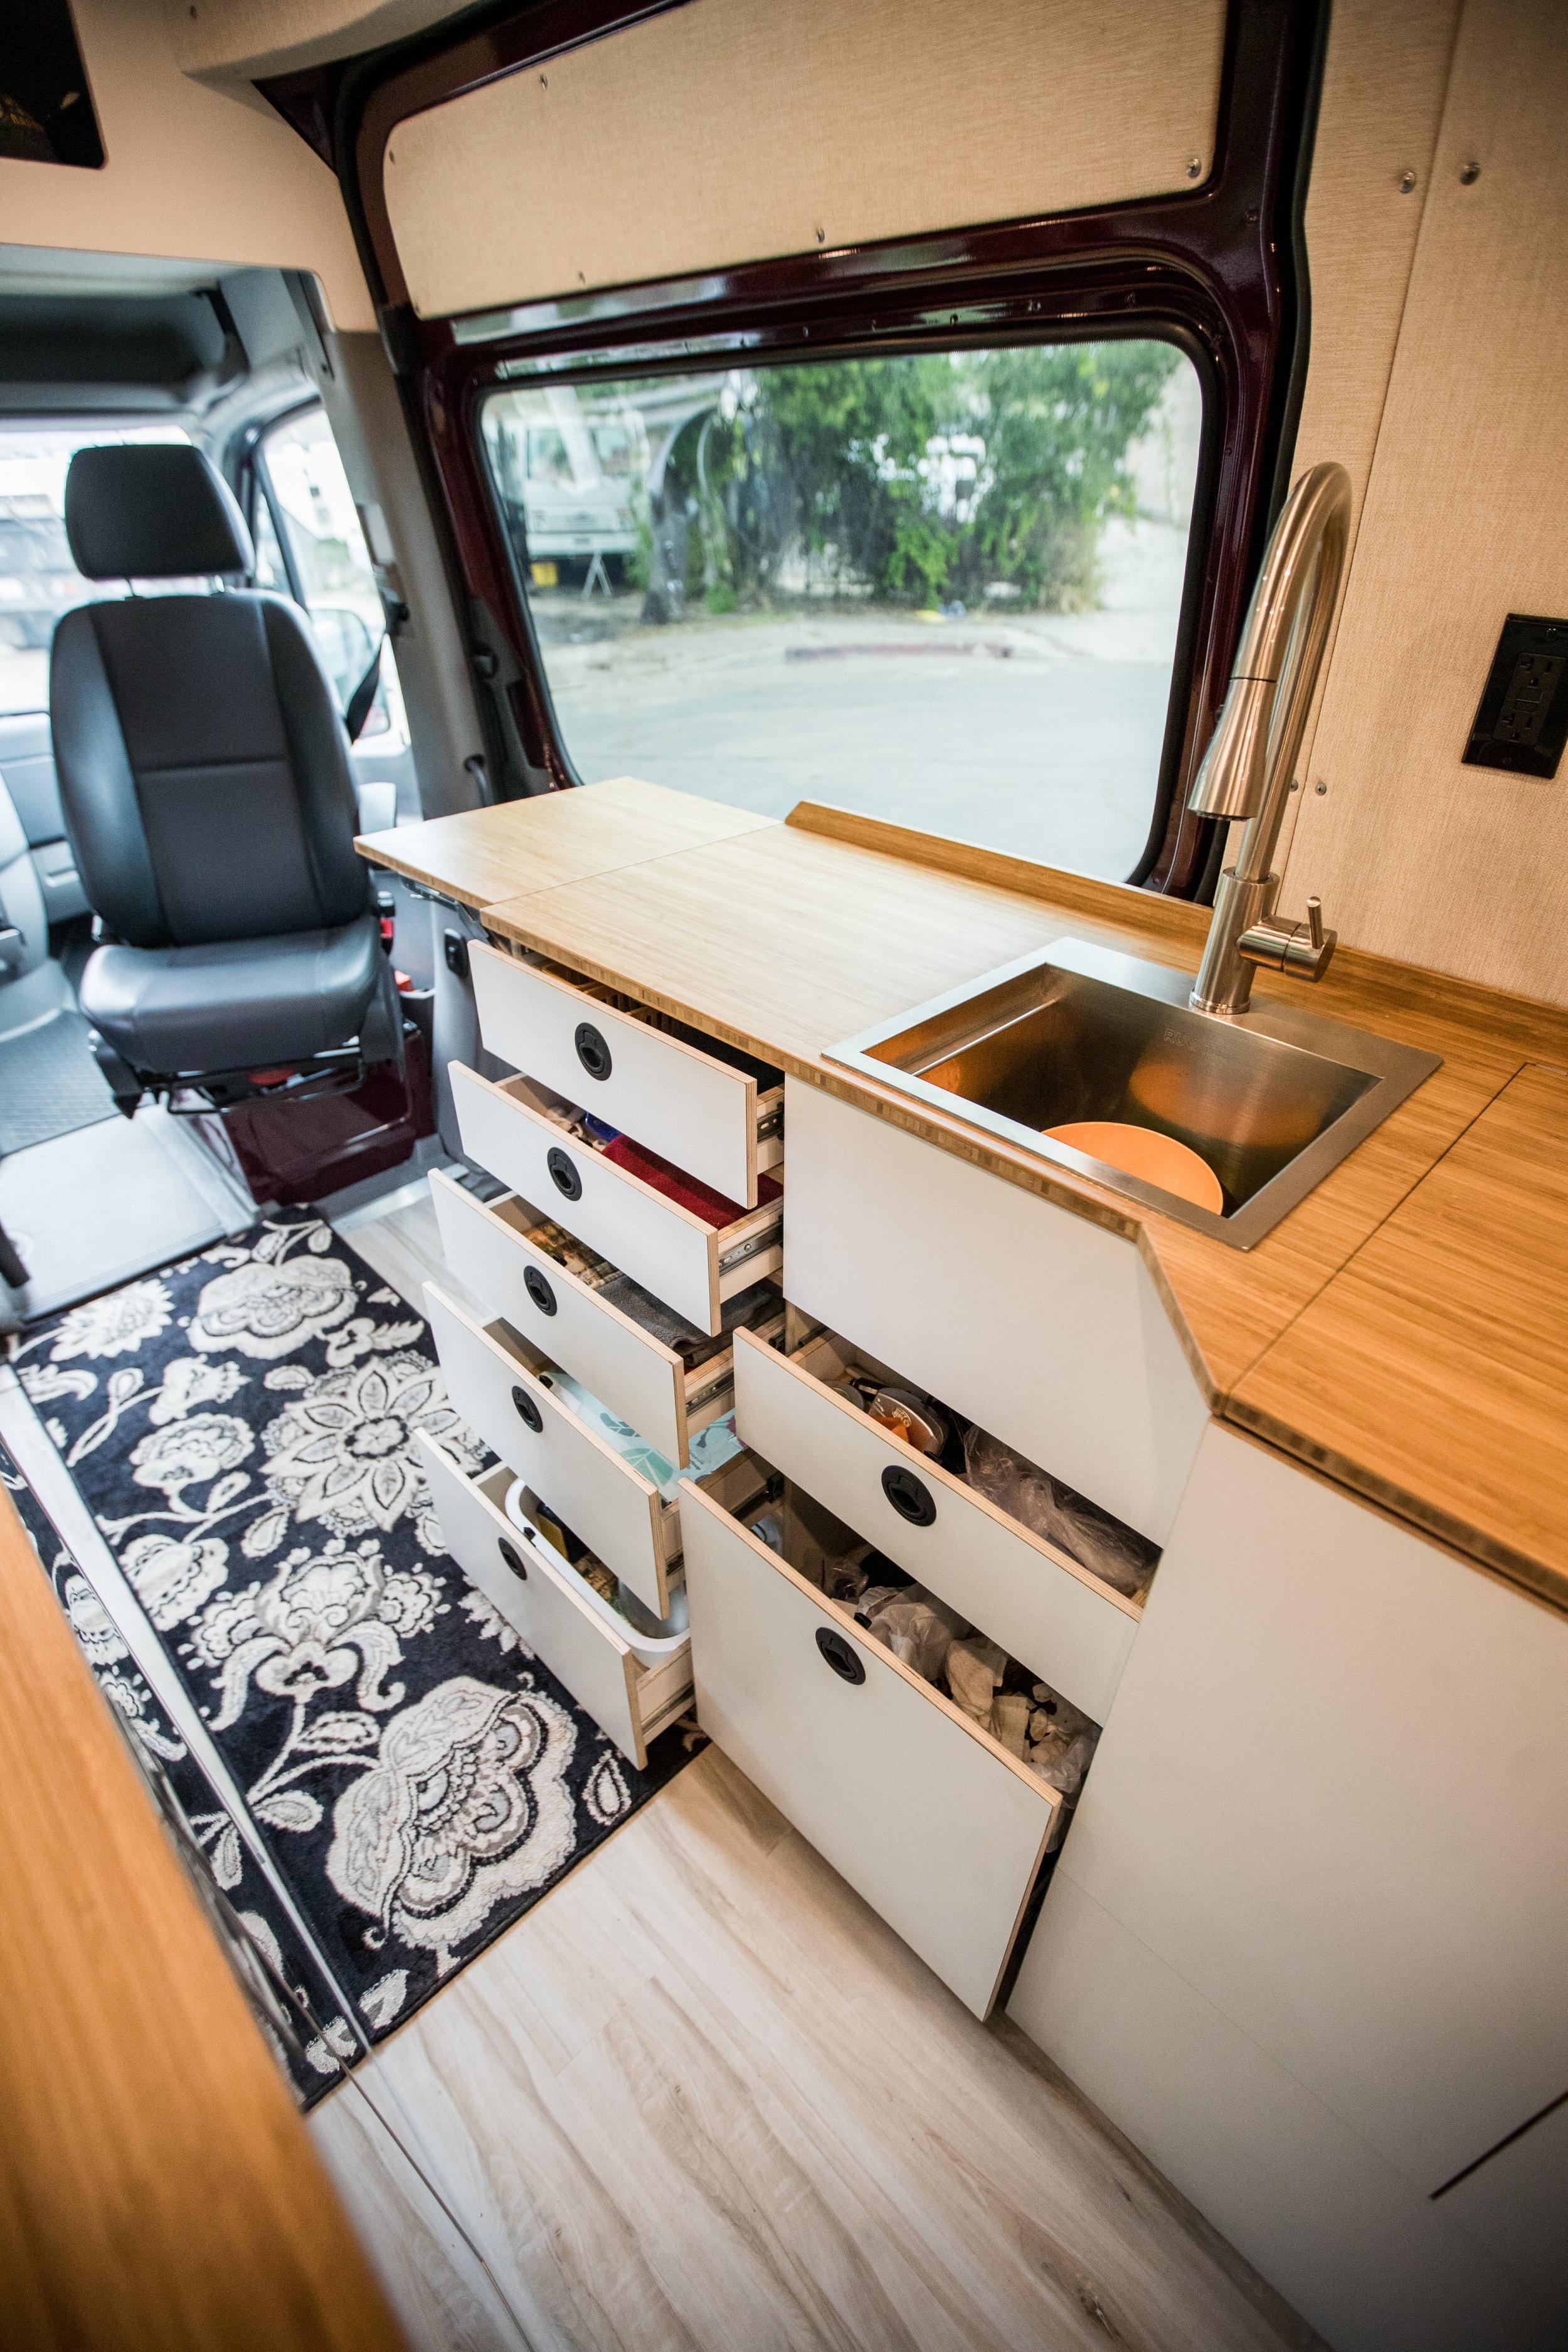 170 Sprinter Interior